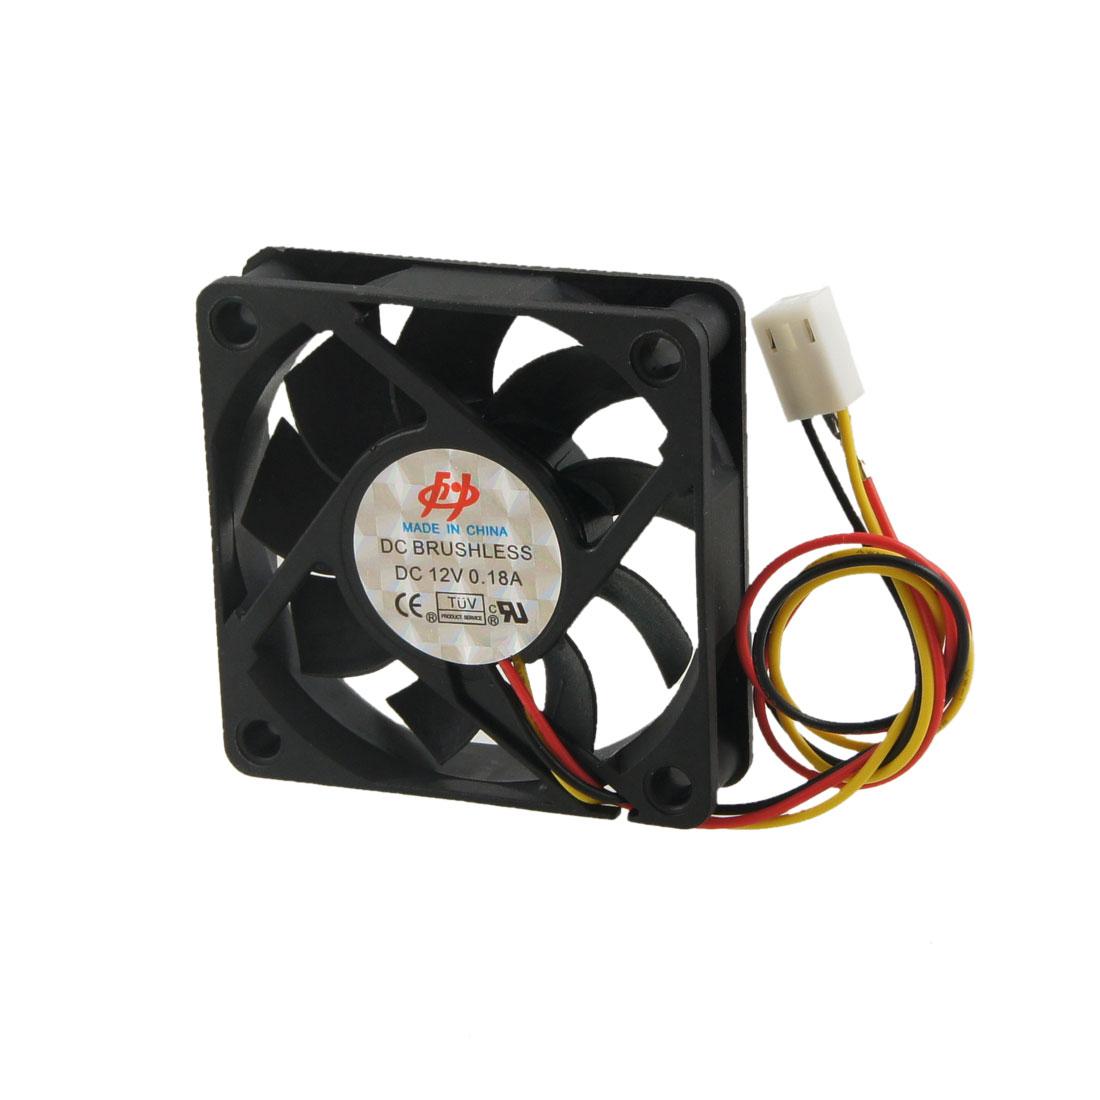 Black Plastic Brushless 3 Pin DC 12V 0.18A 60mm Square Cooling Fan Cooler